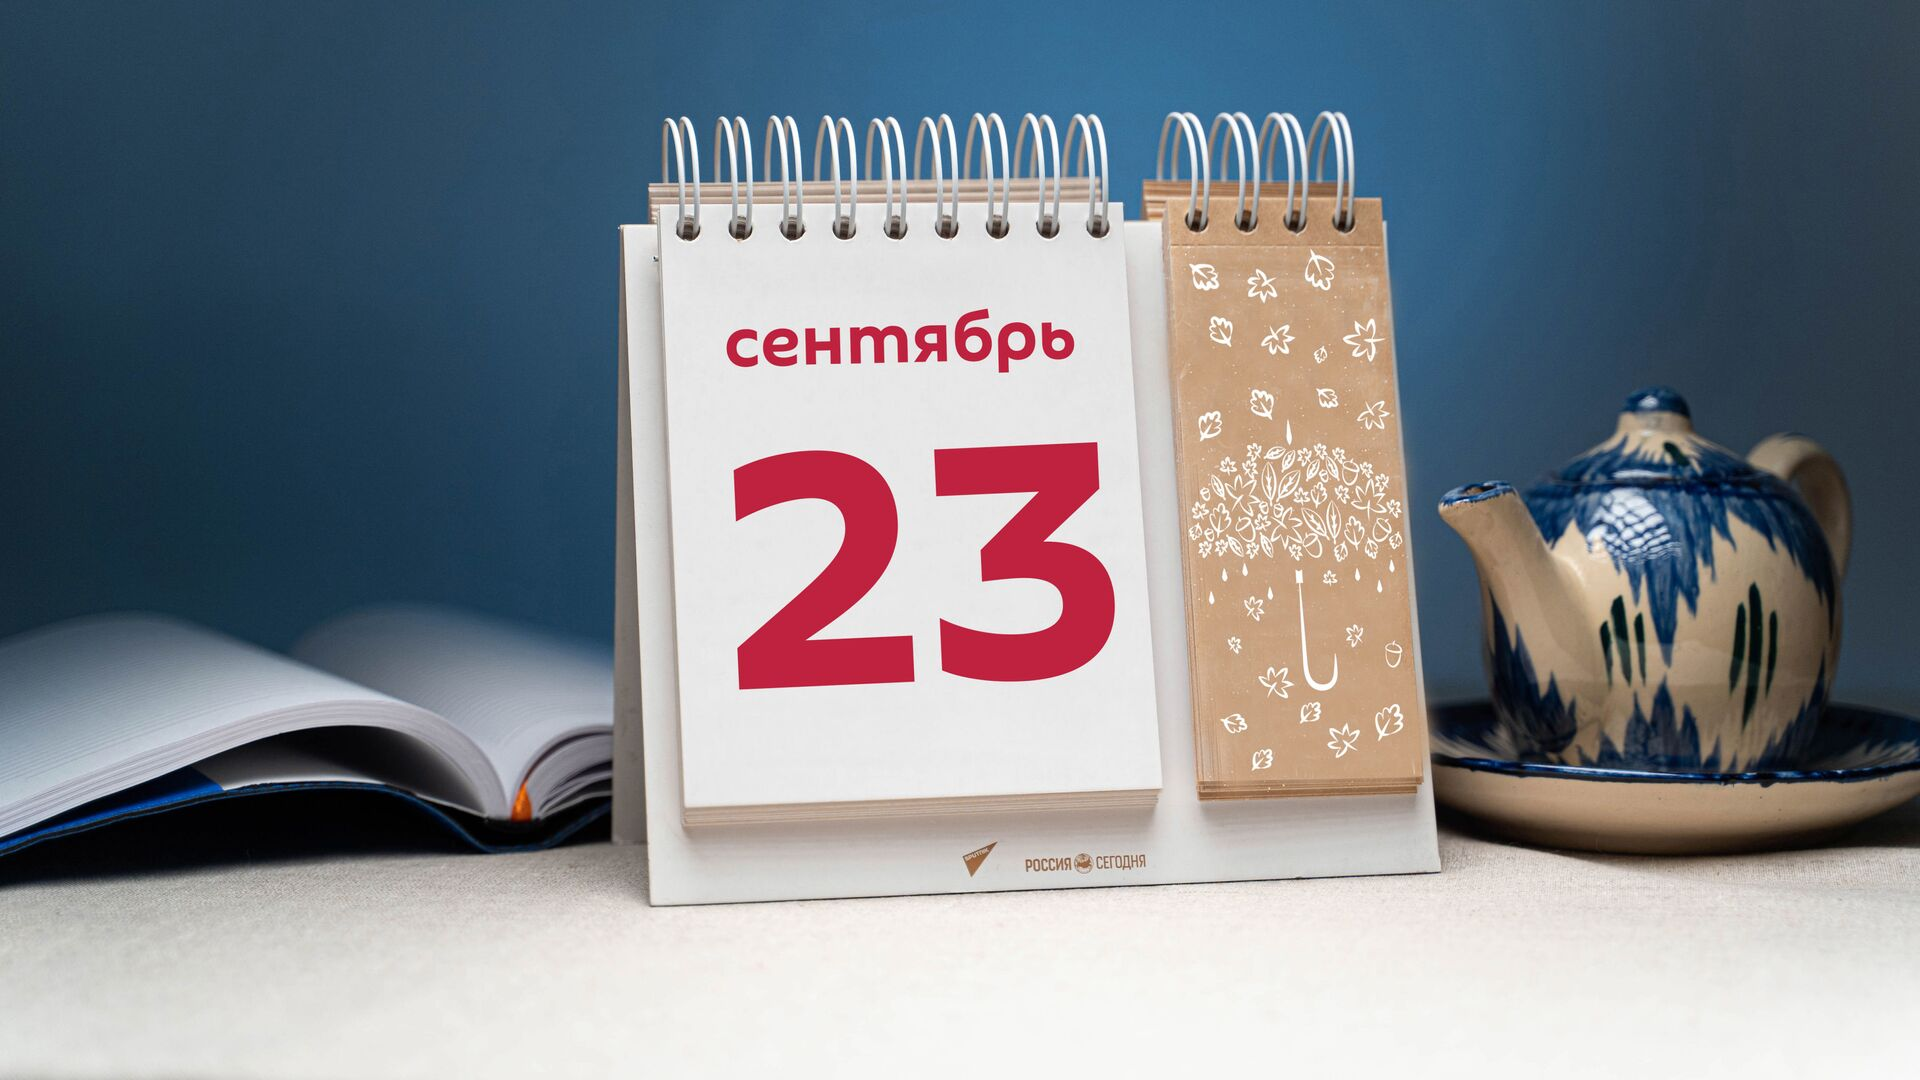 День 23 сентября - Sputnik Тоҷикистон, 1920, 23.09.2021